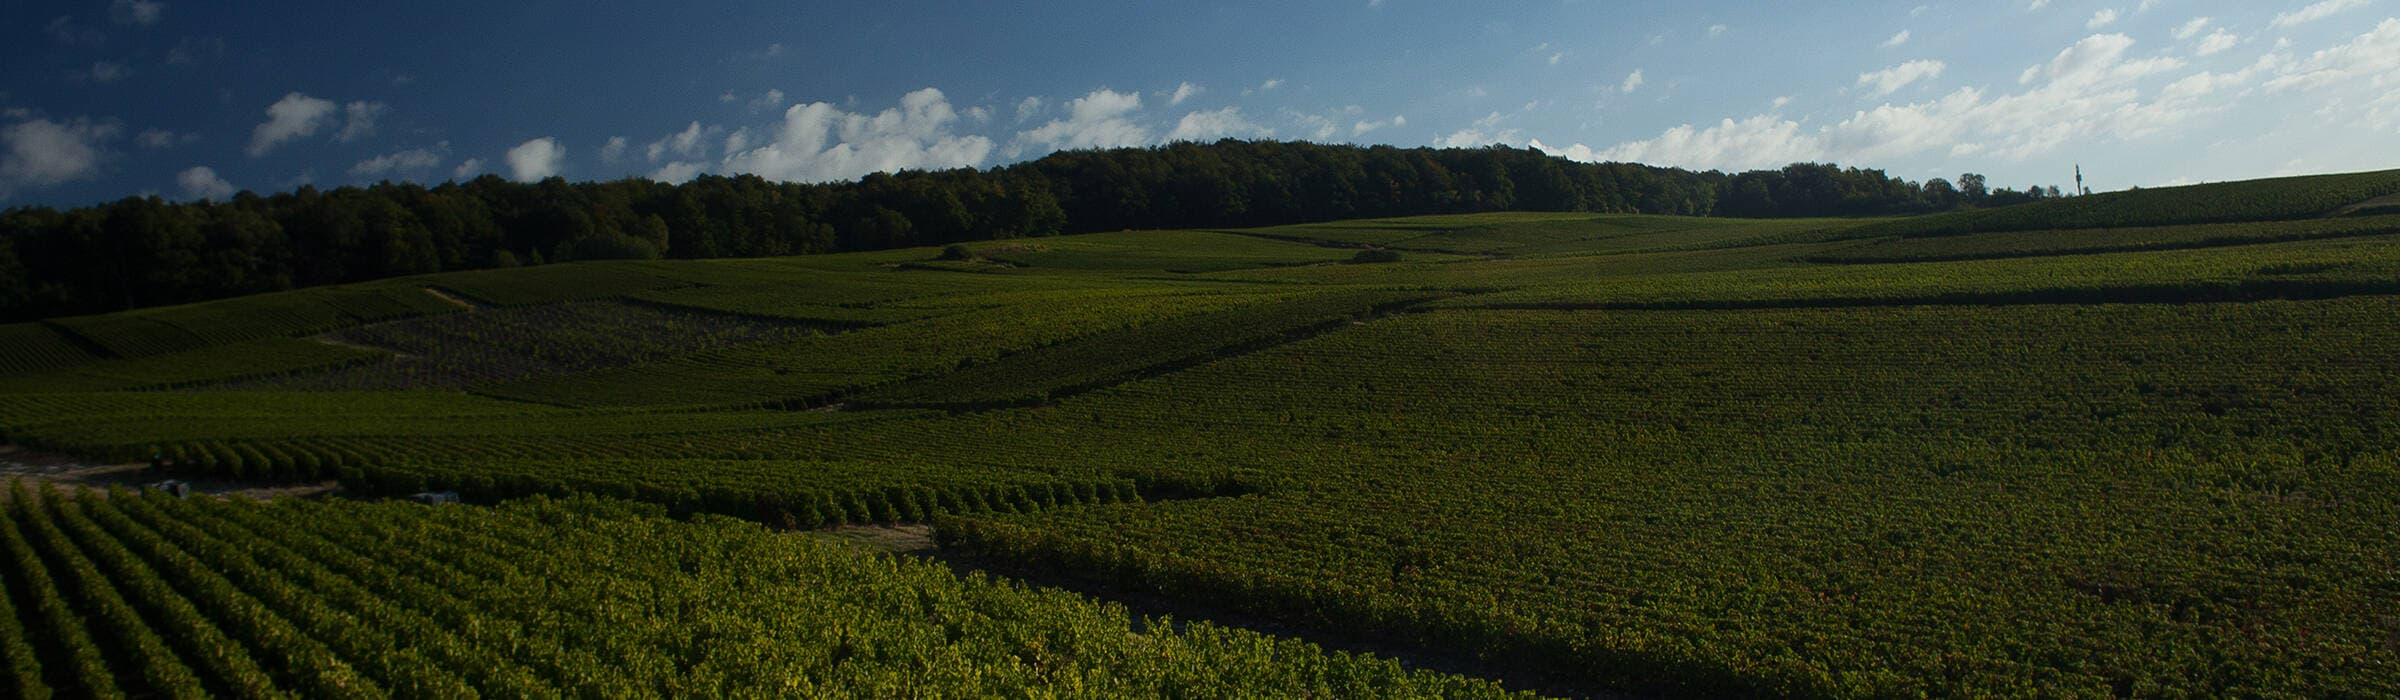 Veuve Clicquot - Виноградник